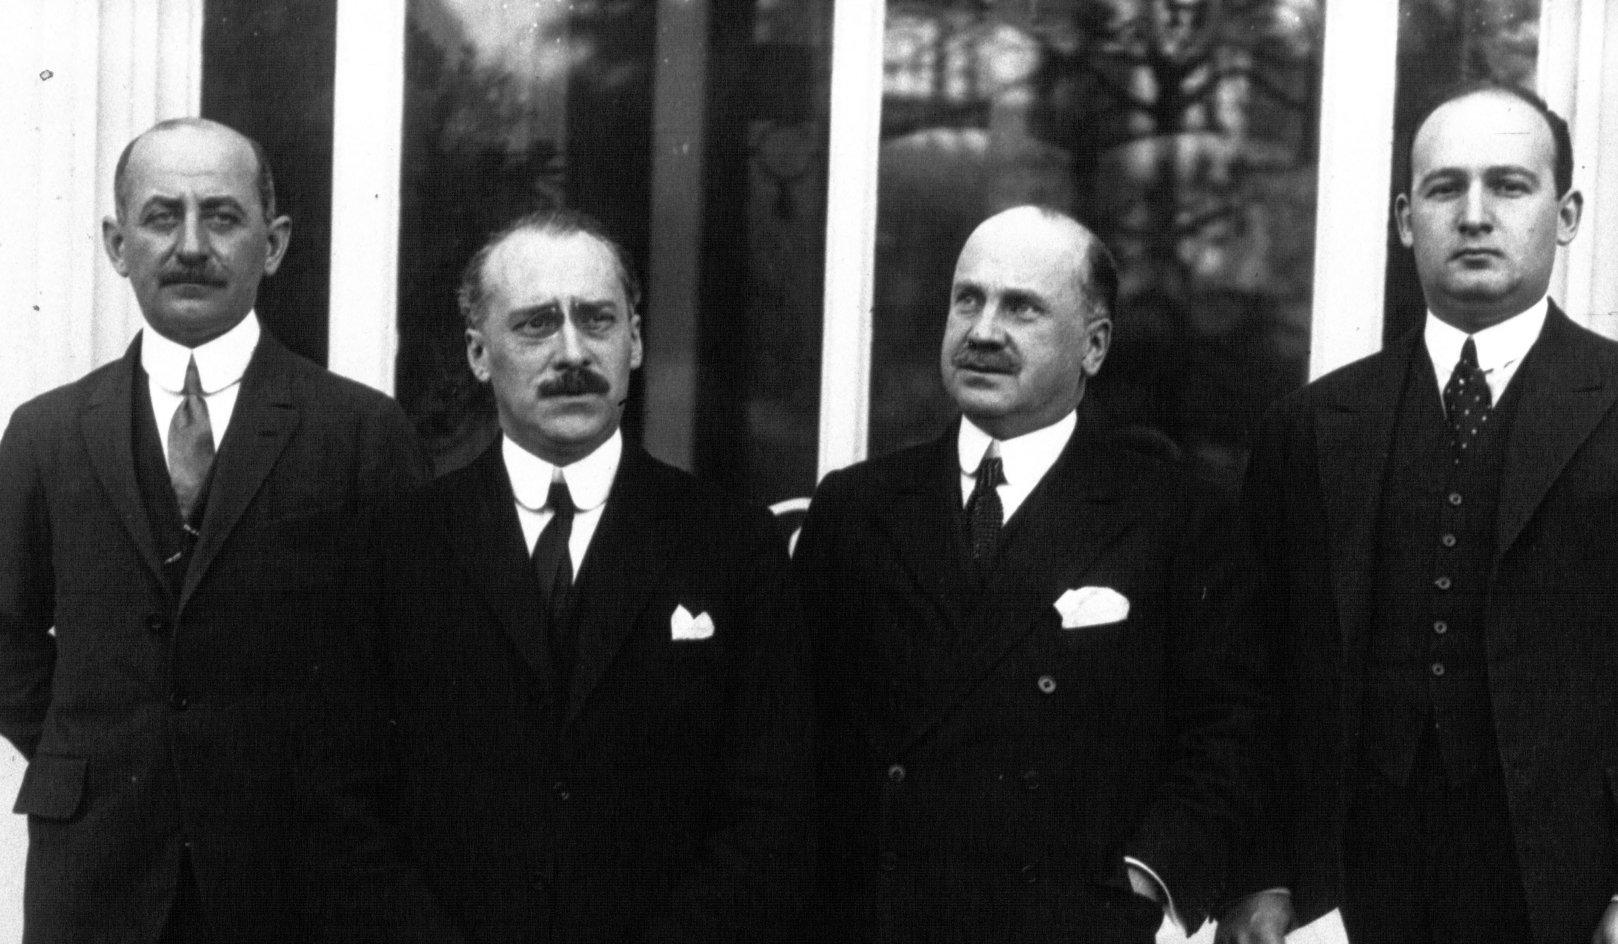 Dimitrescu, G. Duca, Diamandy si Constantinescu la Conferinta de la Lausanne, 1932